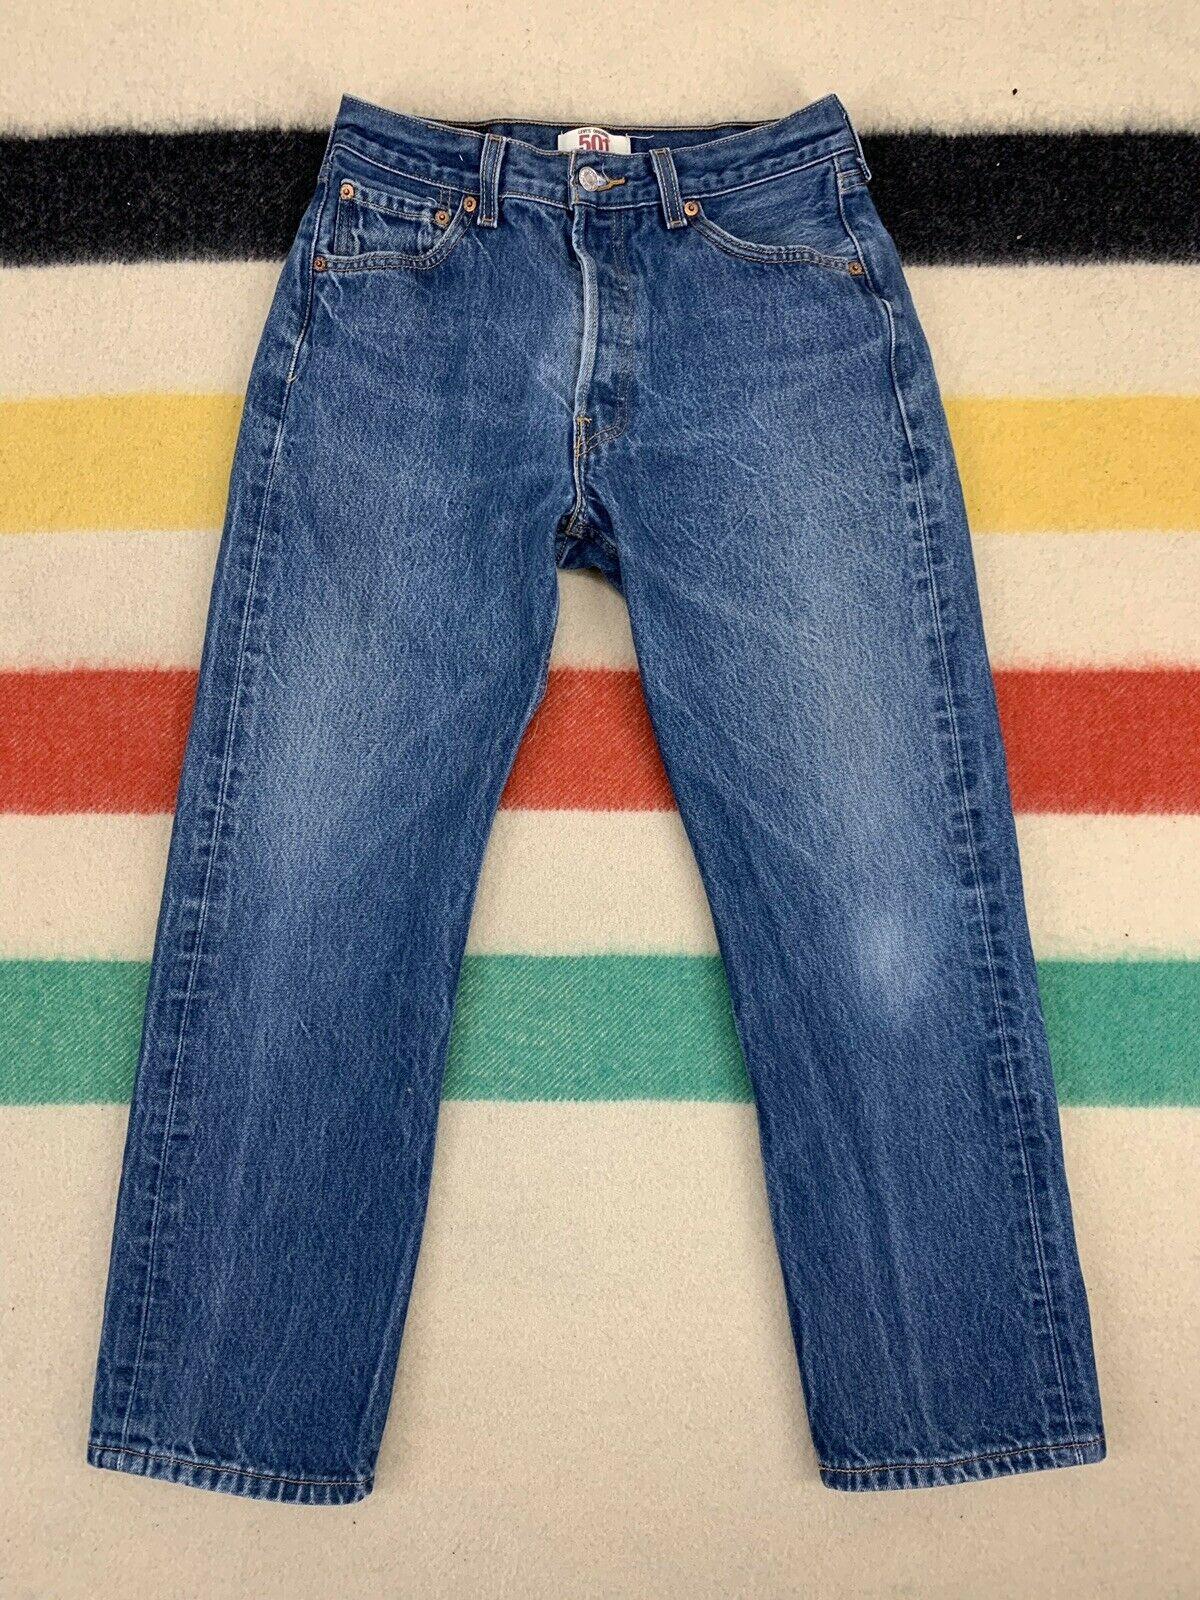 SLIM Rock 2er-Set Jeans Blau Leoparden Look in verschiedenen Größen